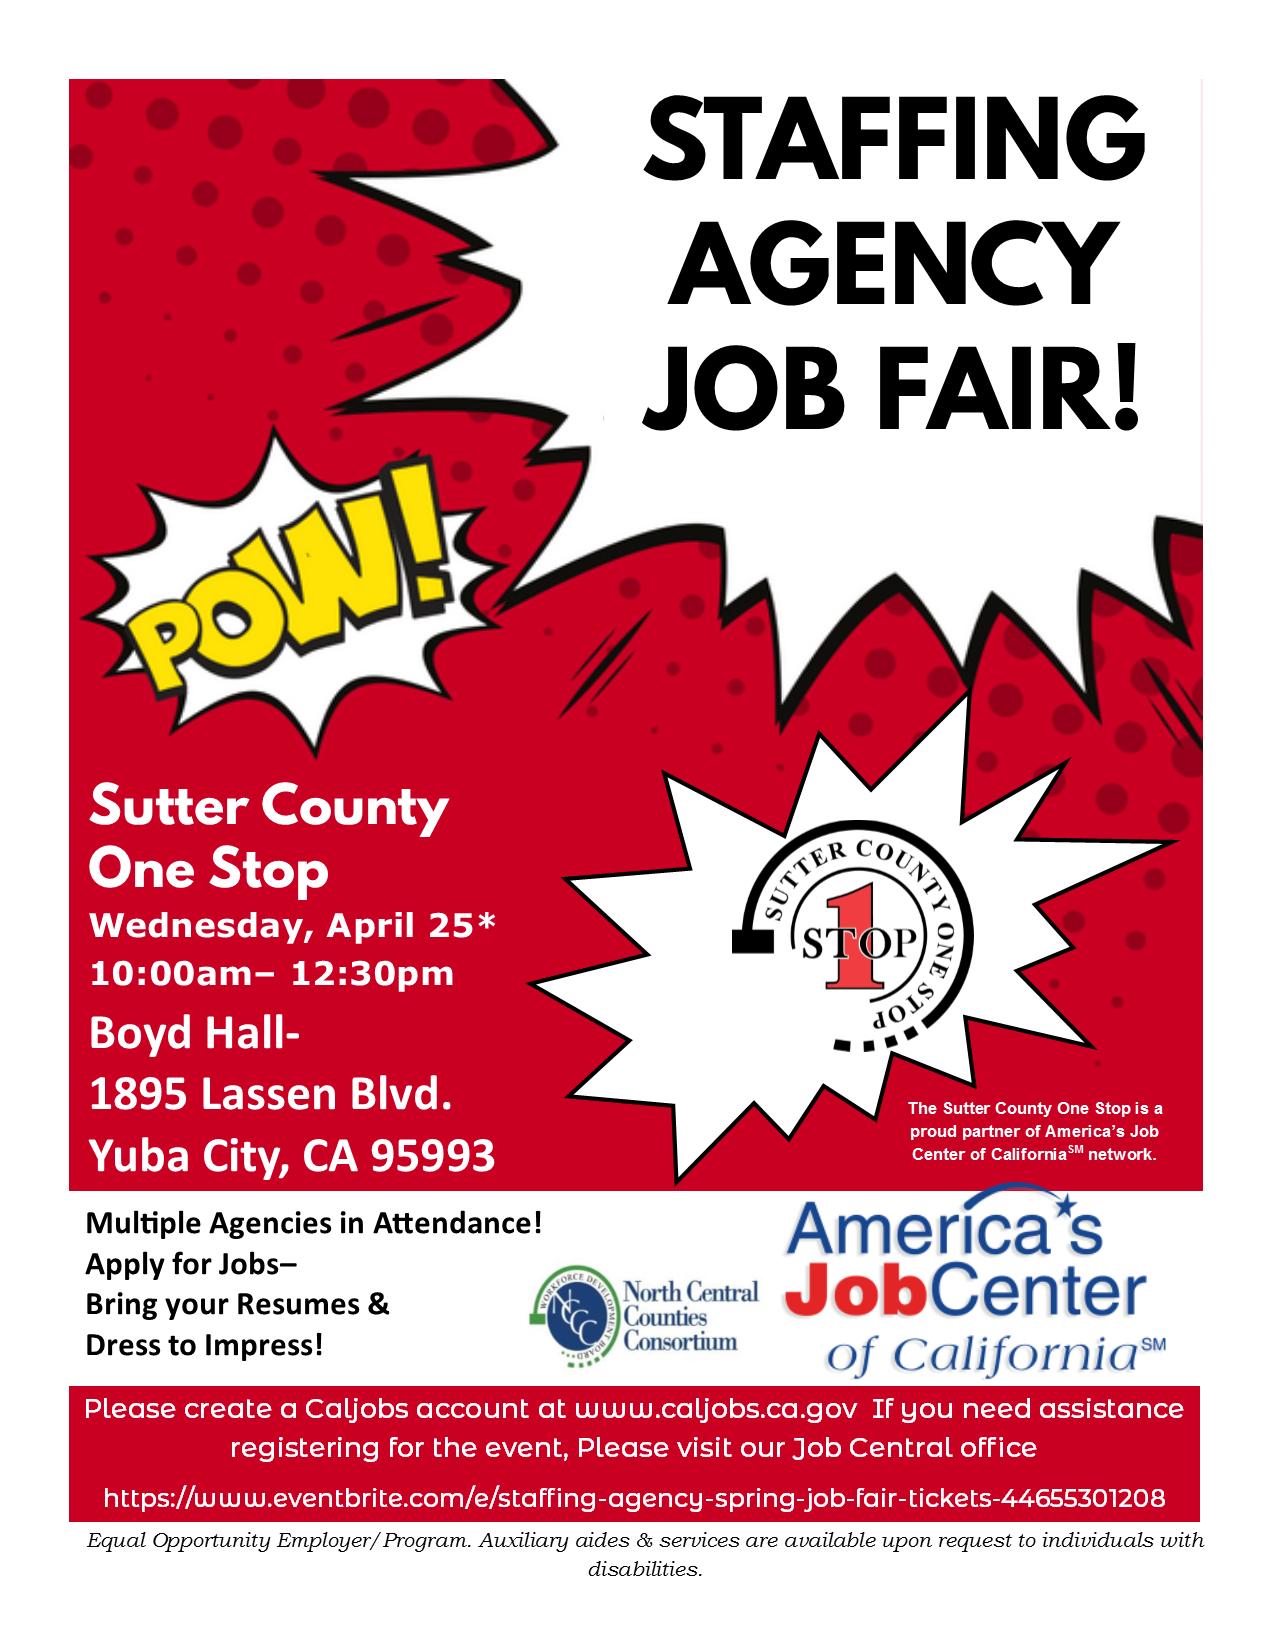 Staffing Agency Spring Job Fair | Yuba City, CA